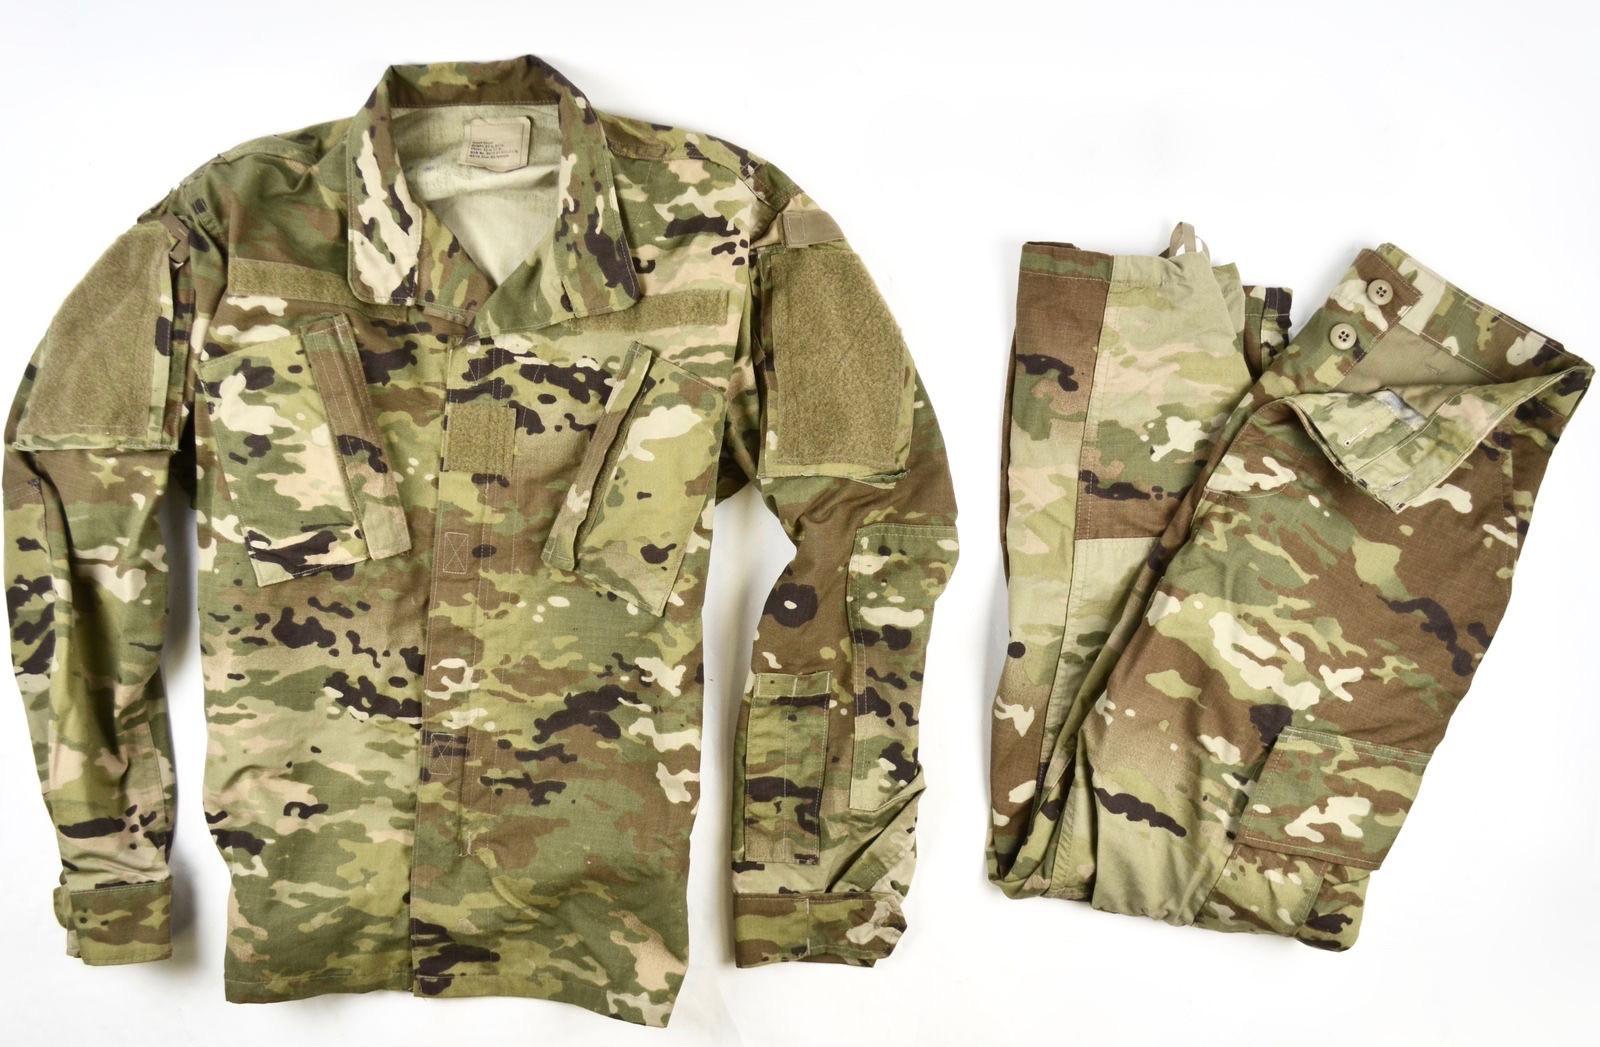 army usgi military uniform scorpion w2 ocp camo shirt pant ml medium